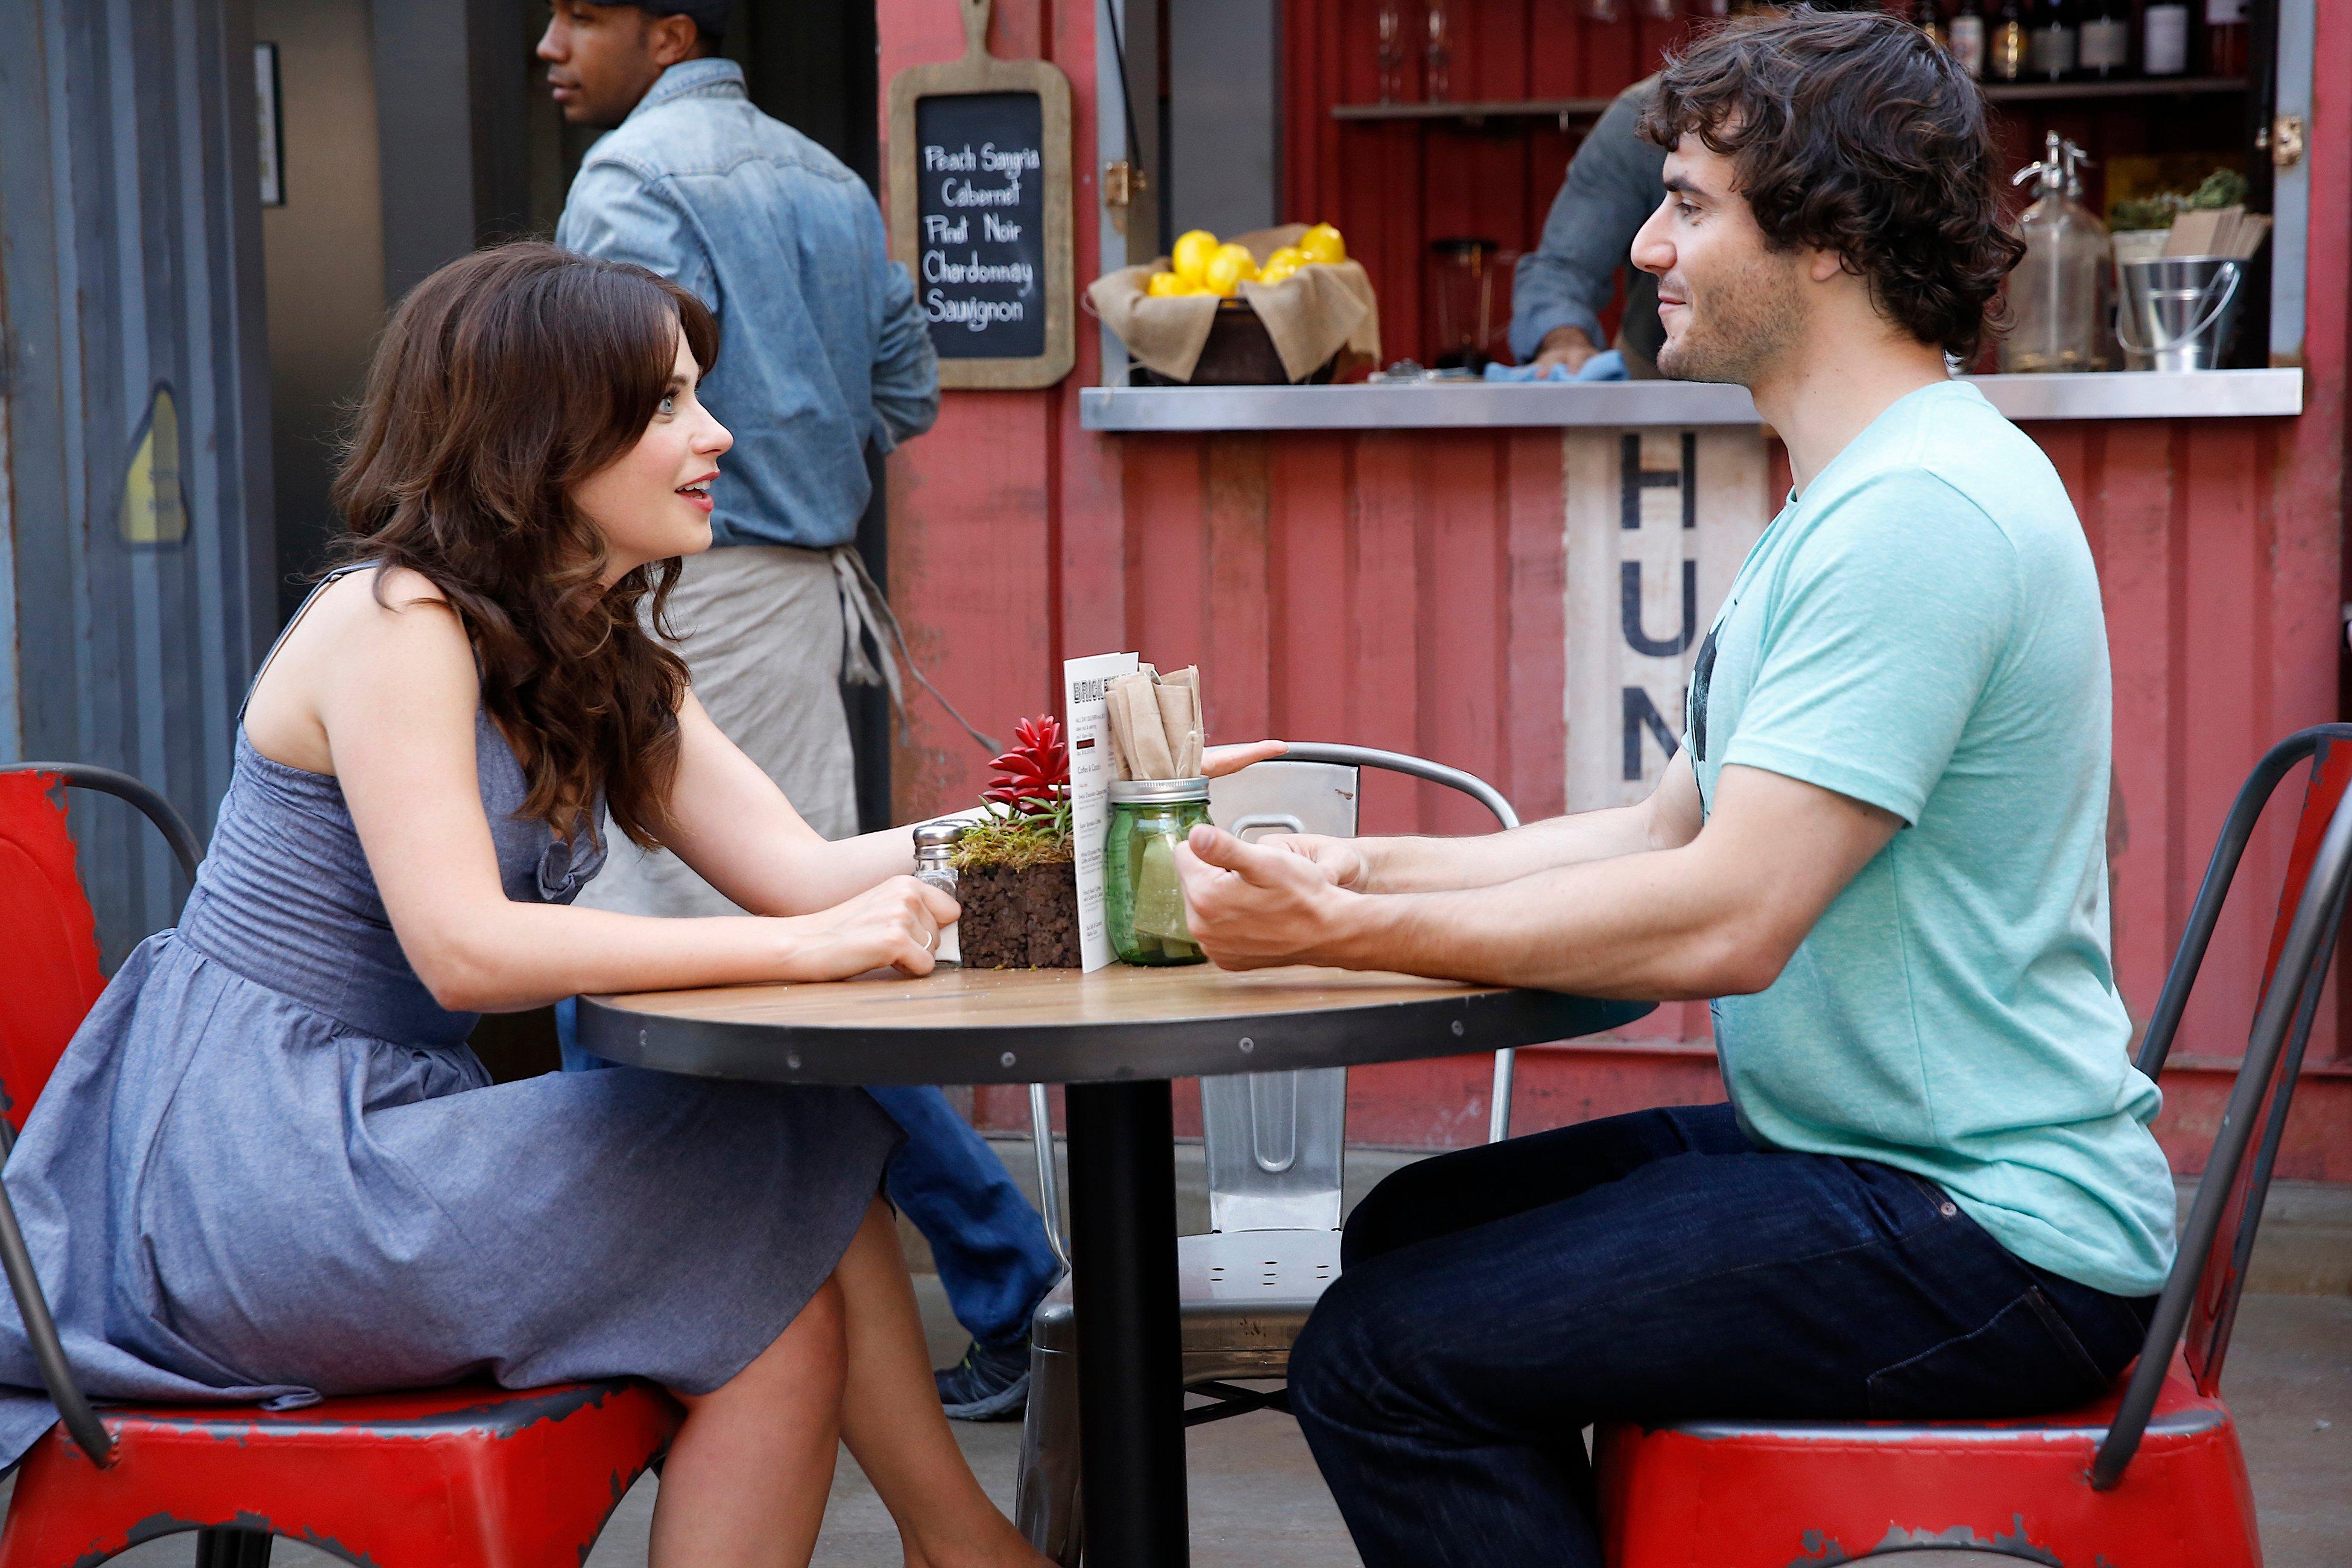 Interracial dating hungary